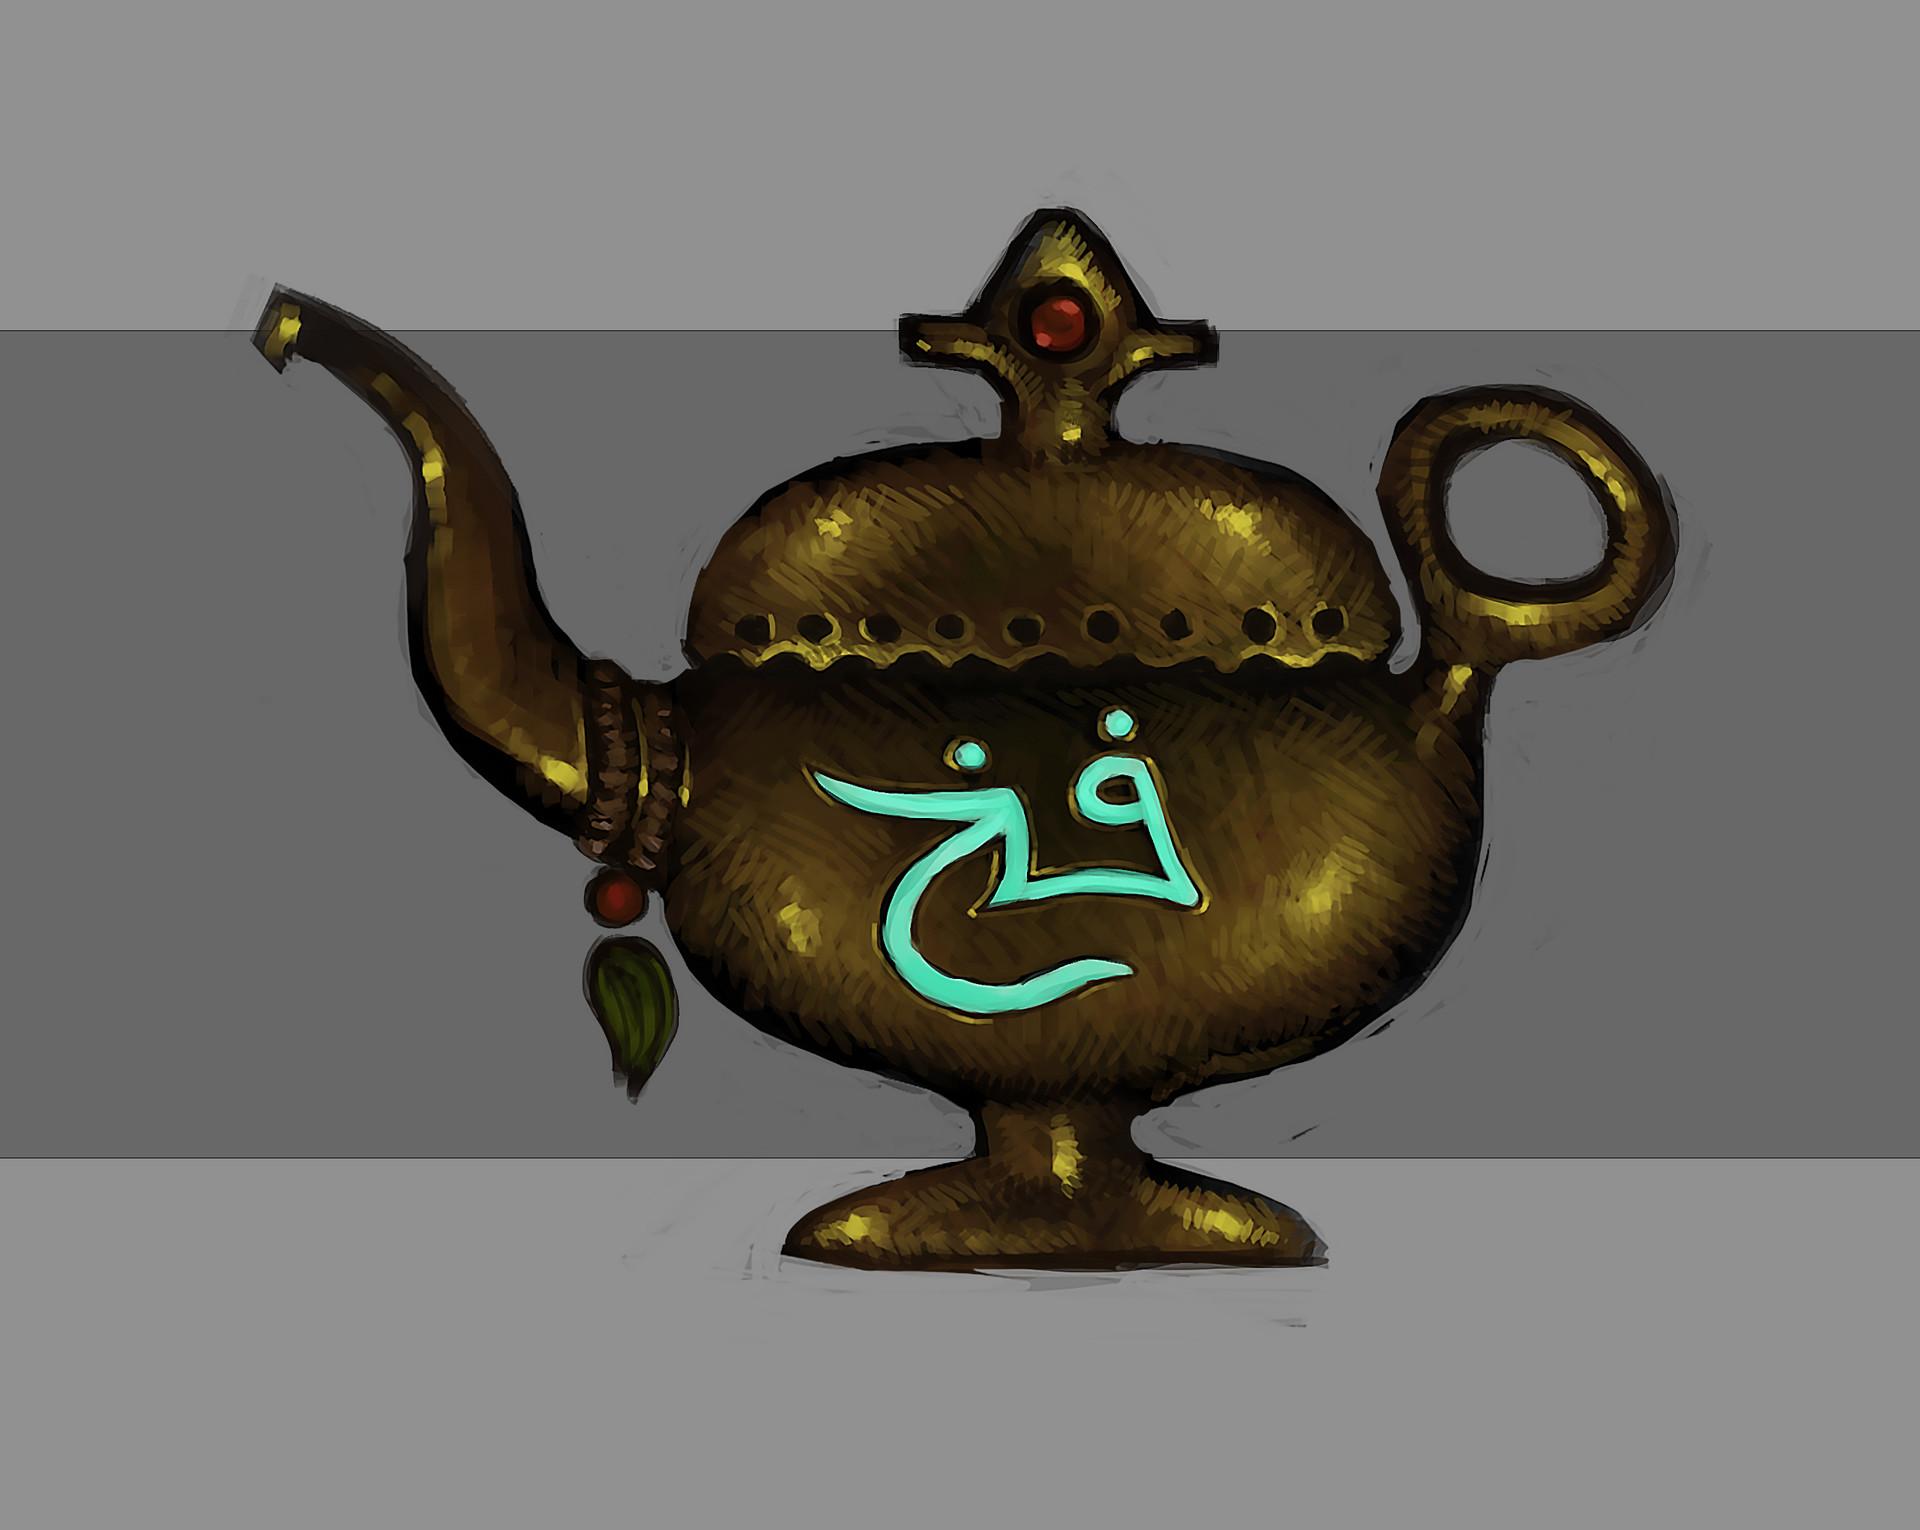 Teodora dimova chosen lamp